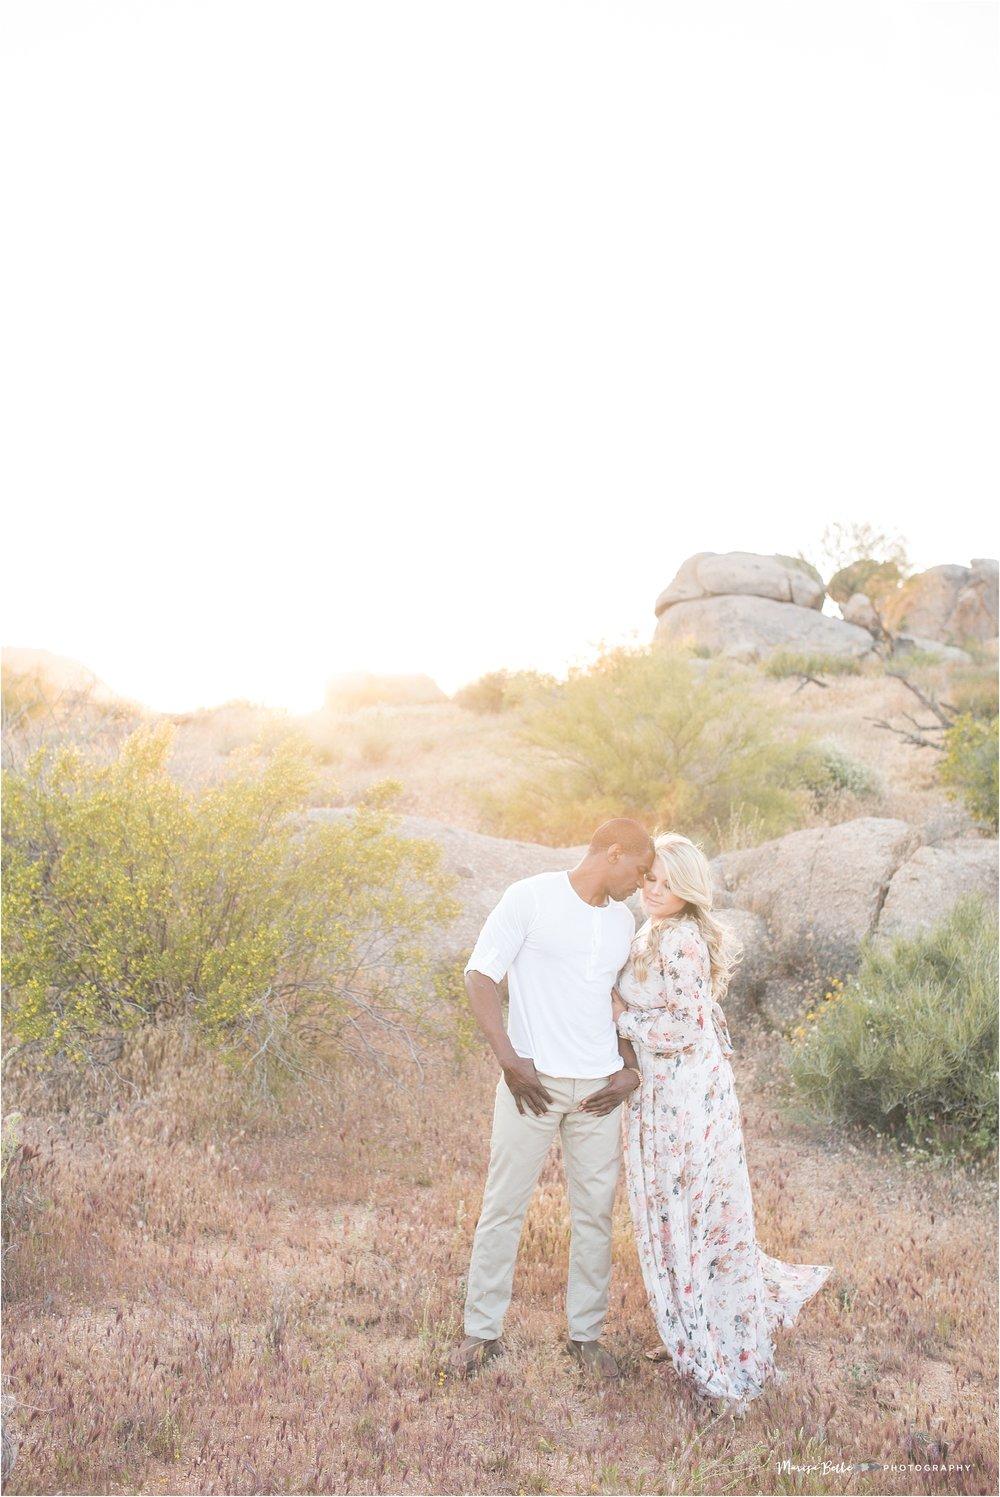 Tom's Thumb Trailhead | Scottsdale, Arizona | Phoenix Engagement and Wedding Photographer | www.marisabellephotography.com-14.jpg